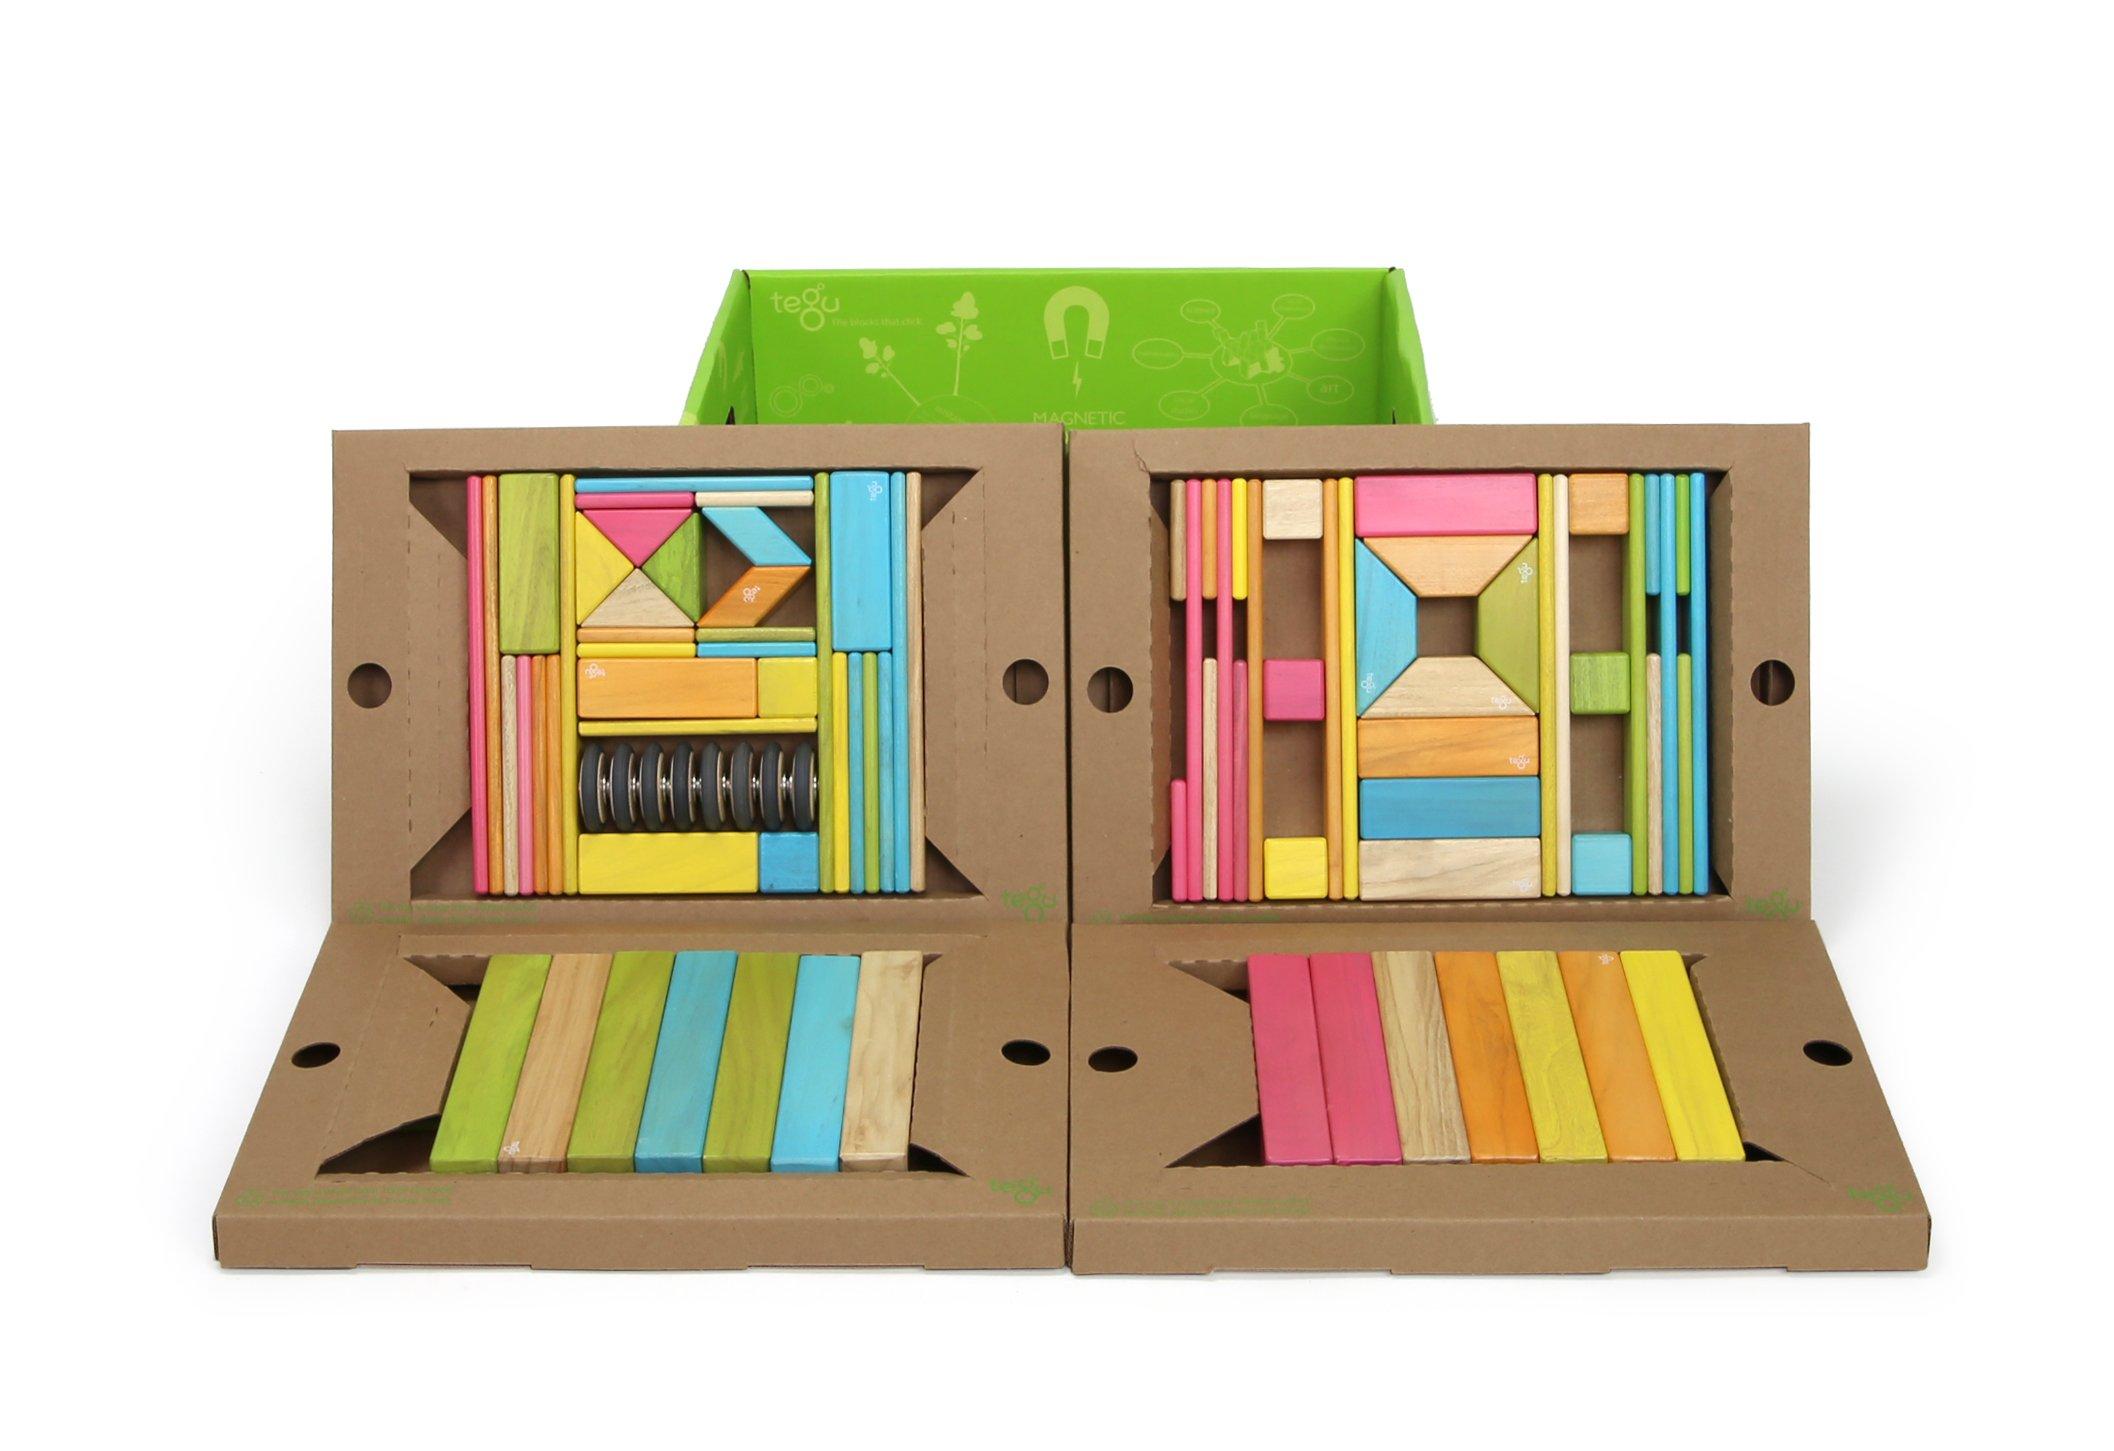 90 Piece Tegu Classroom Magnetic Wooden Block Set, Tints by Tegu (Image #3)